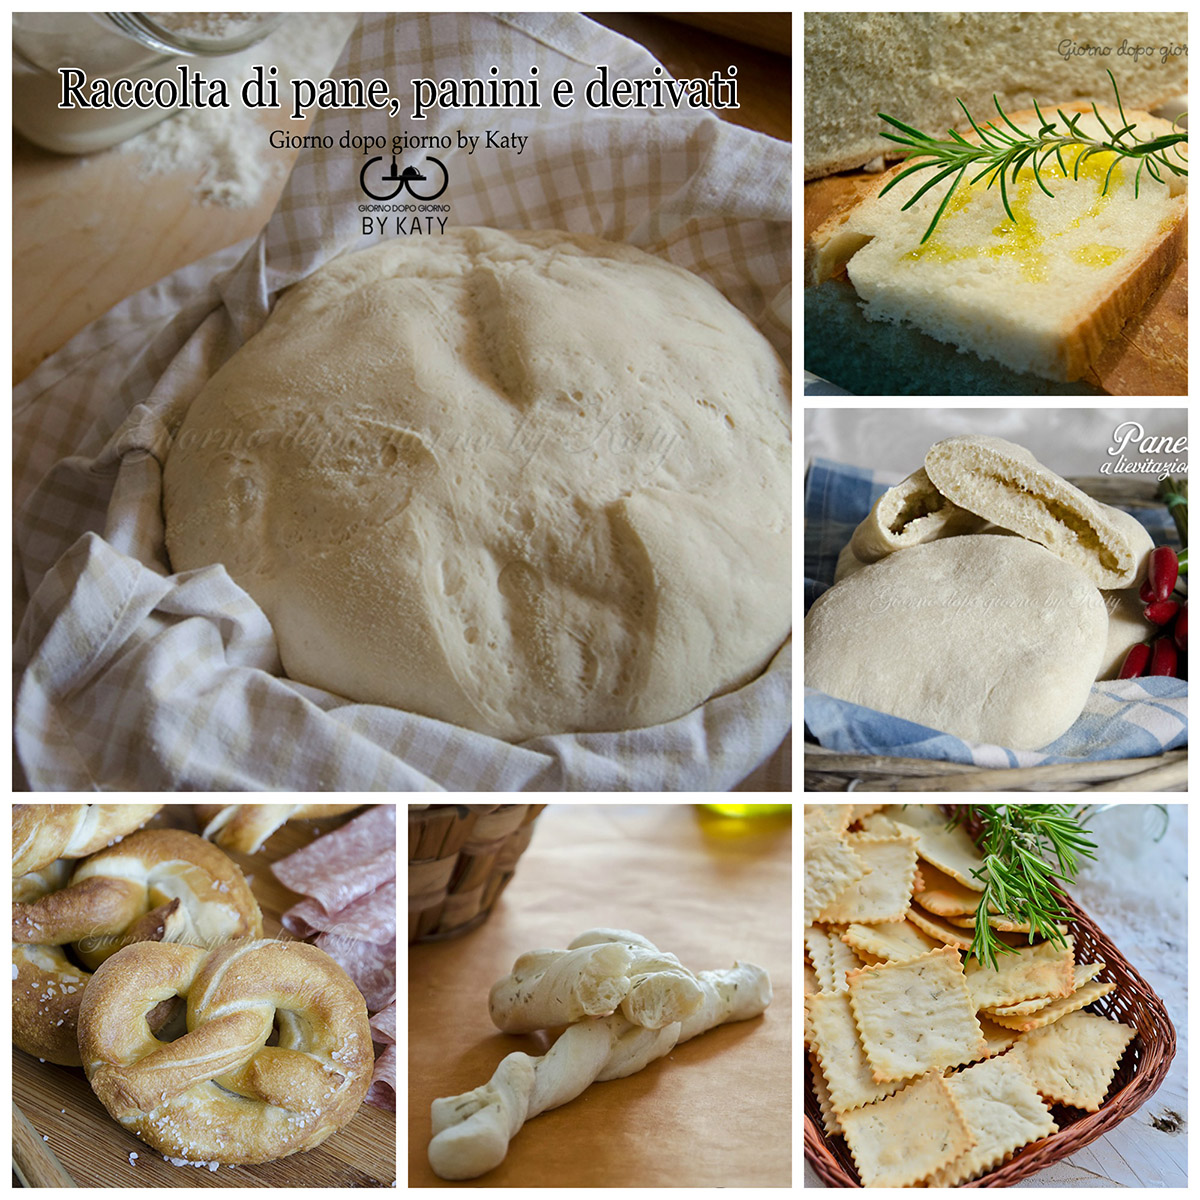 pane lievitati raccolta ricette, crackers, grissini, panini